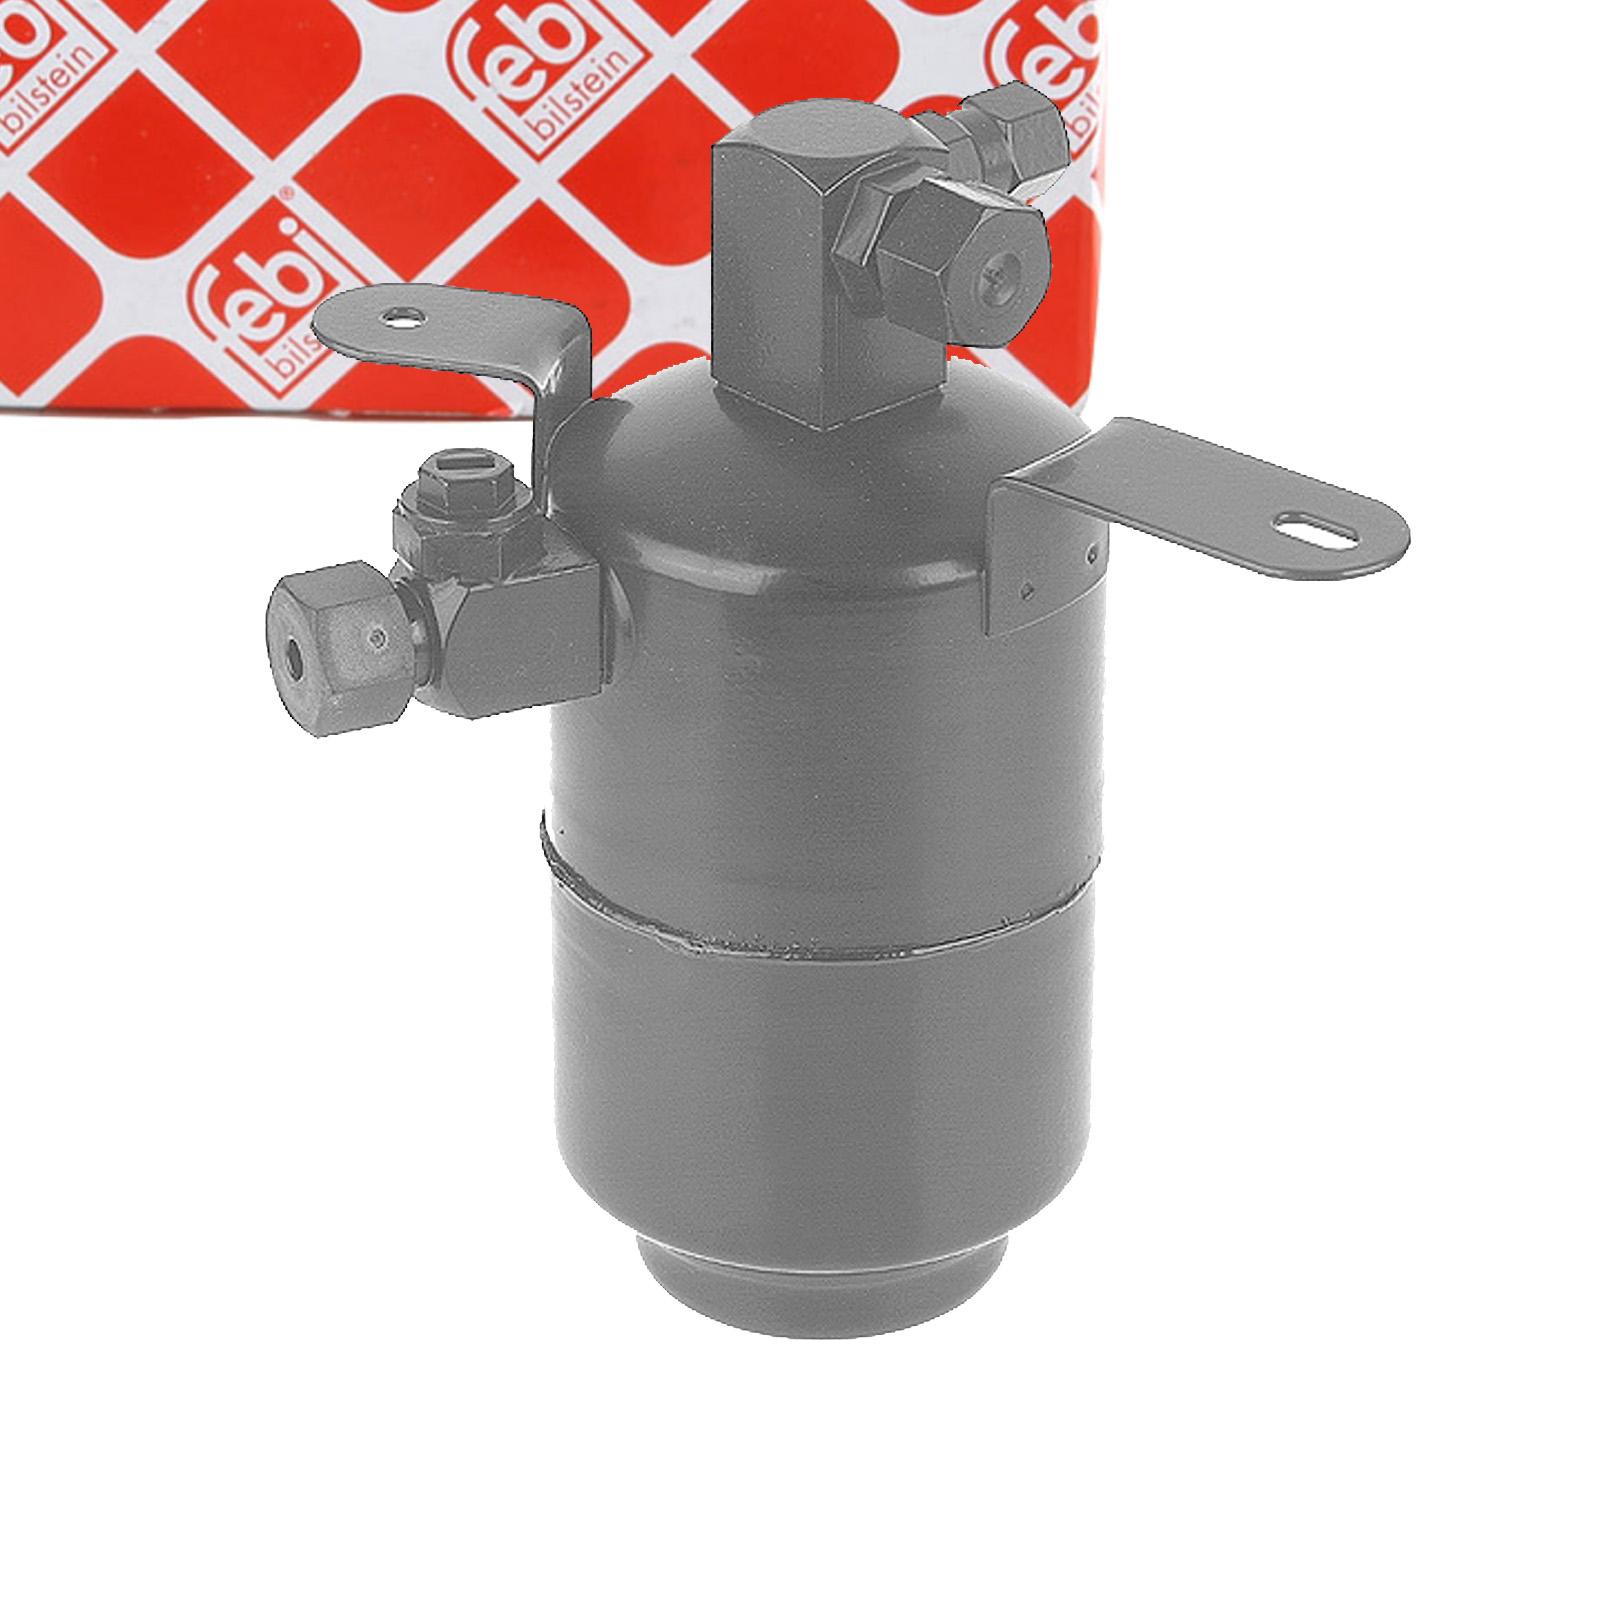 FEBI 10607 Trockner Klimaanlage MERCEDES E-Klasse W210 S210 mit Thermoking